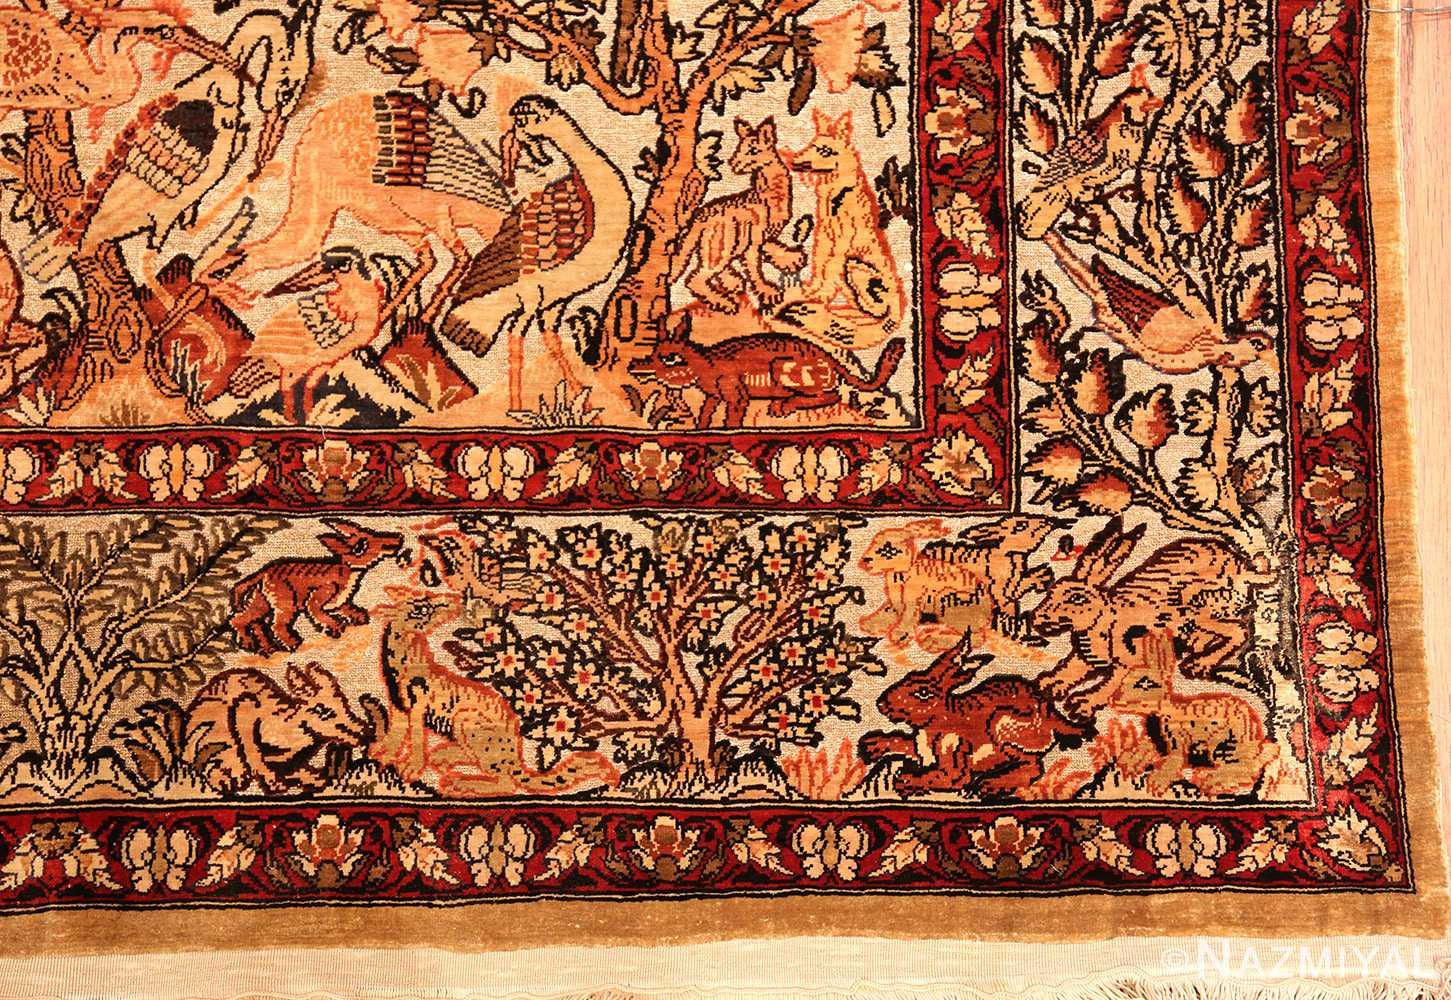 Turkish rug  vintage dog rug  bohemian rug  small area rug  wool rug  stair rug  bathroom rug  antique rug  2.6 x 3.8 ft MB 2173